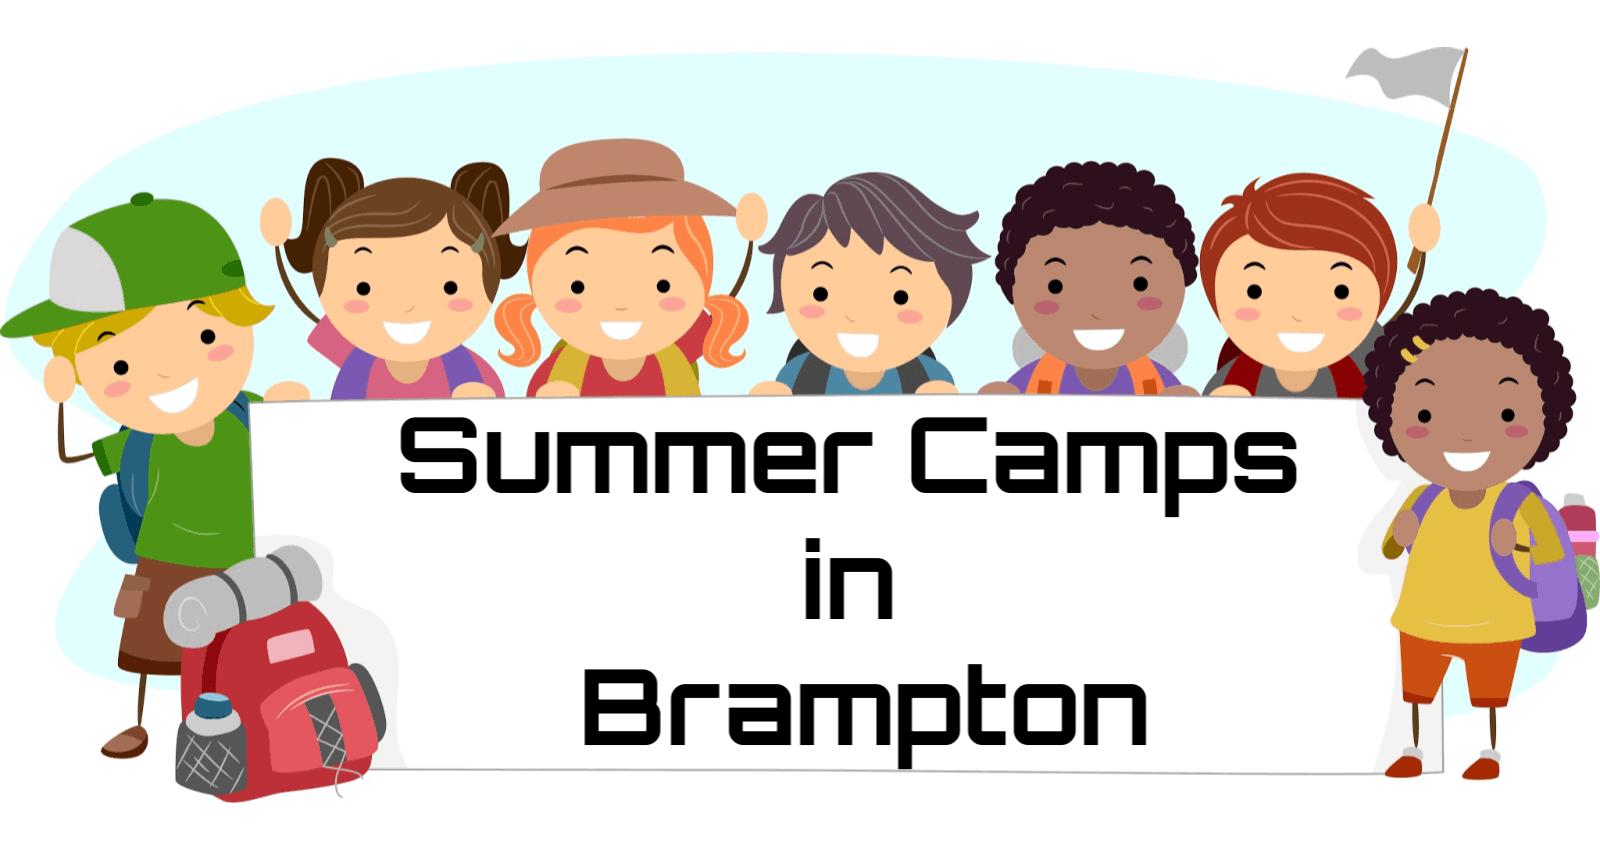 Summer Camps in Brampton